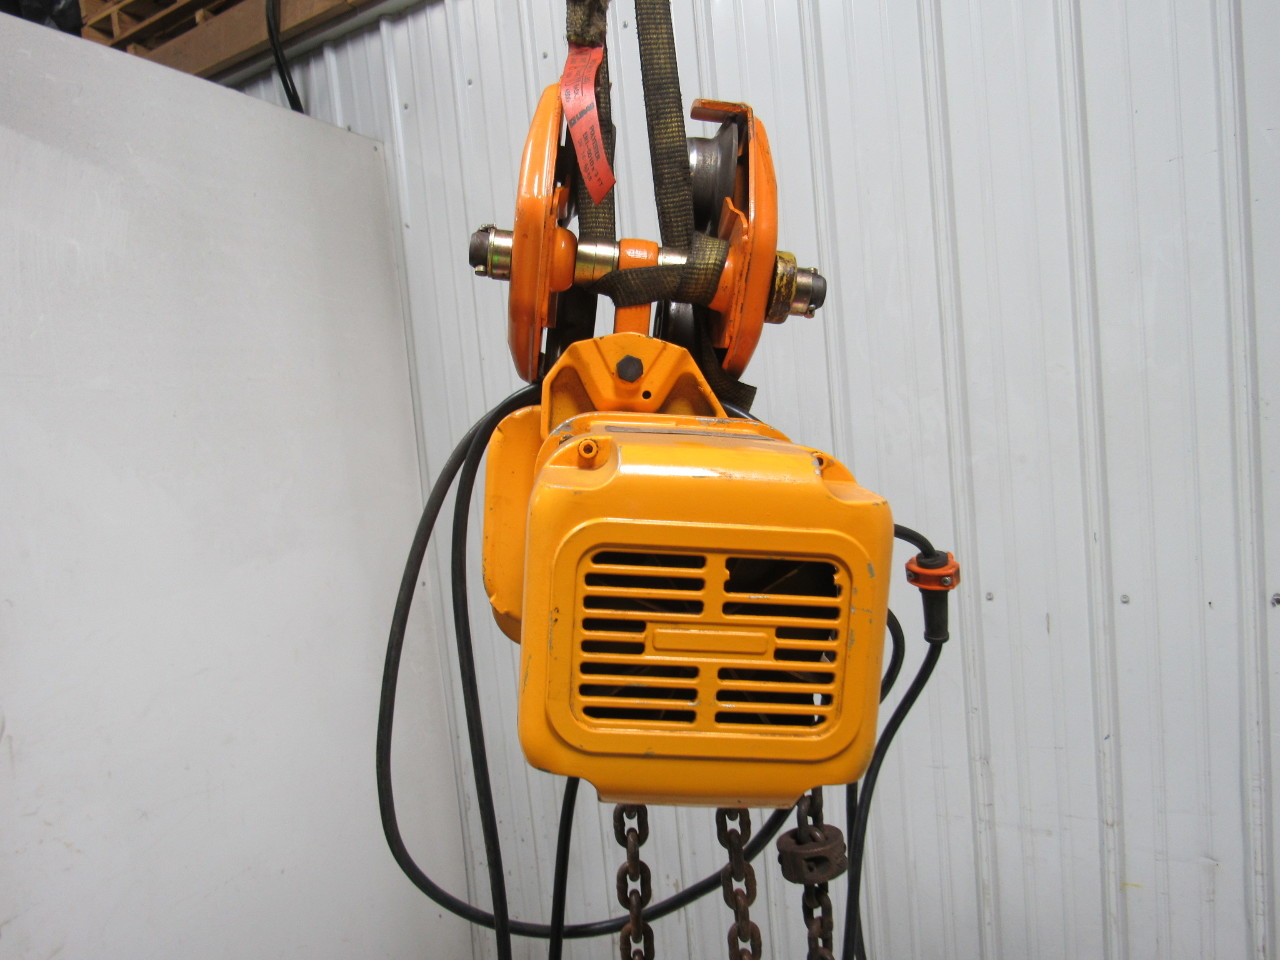 Harrington Ner010l 1 Ton Trolley Electric Chain Hoist 11